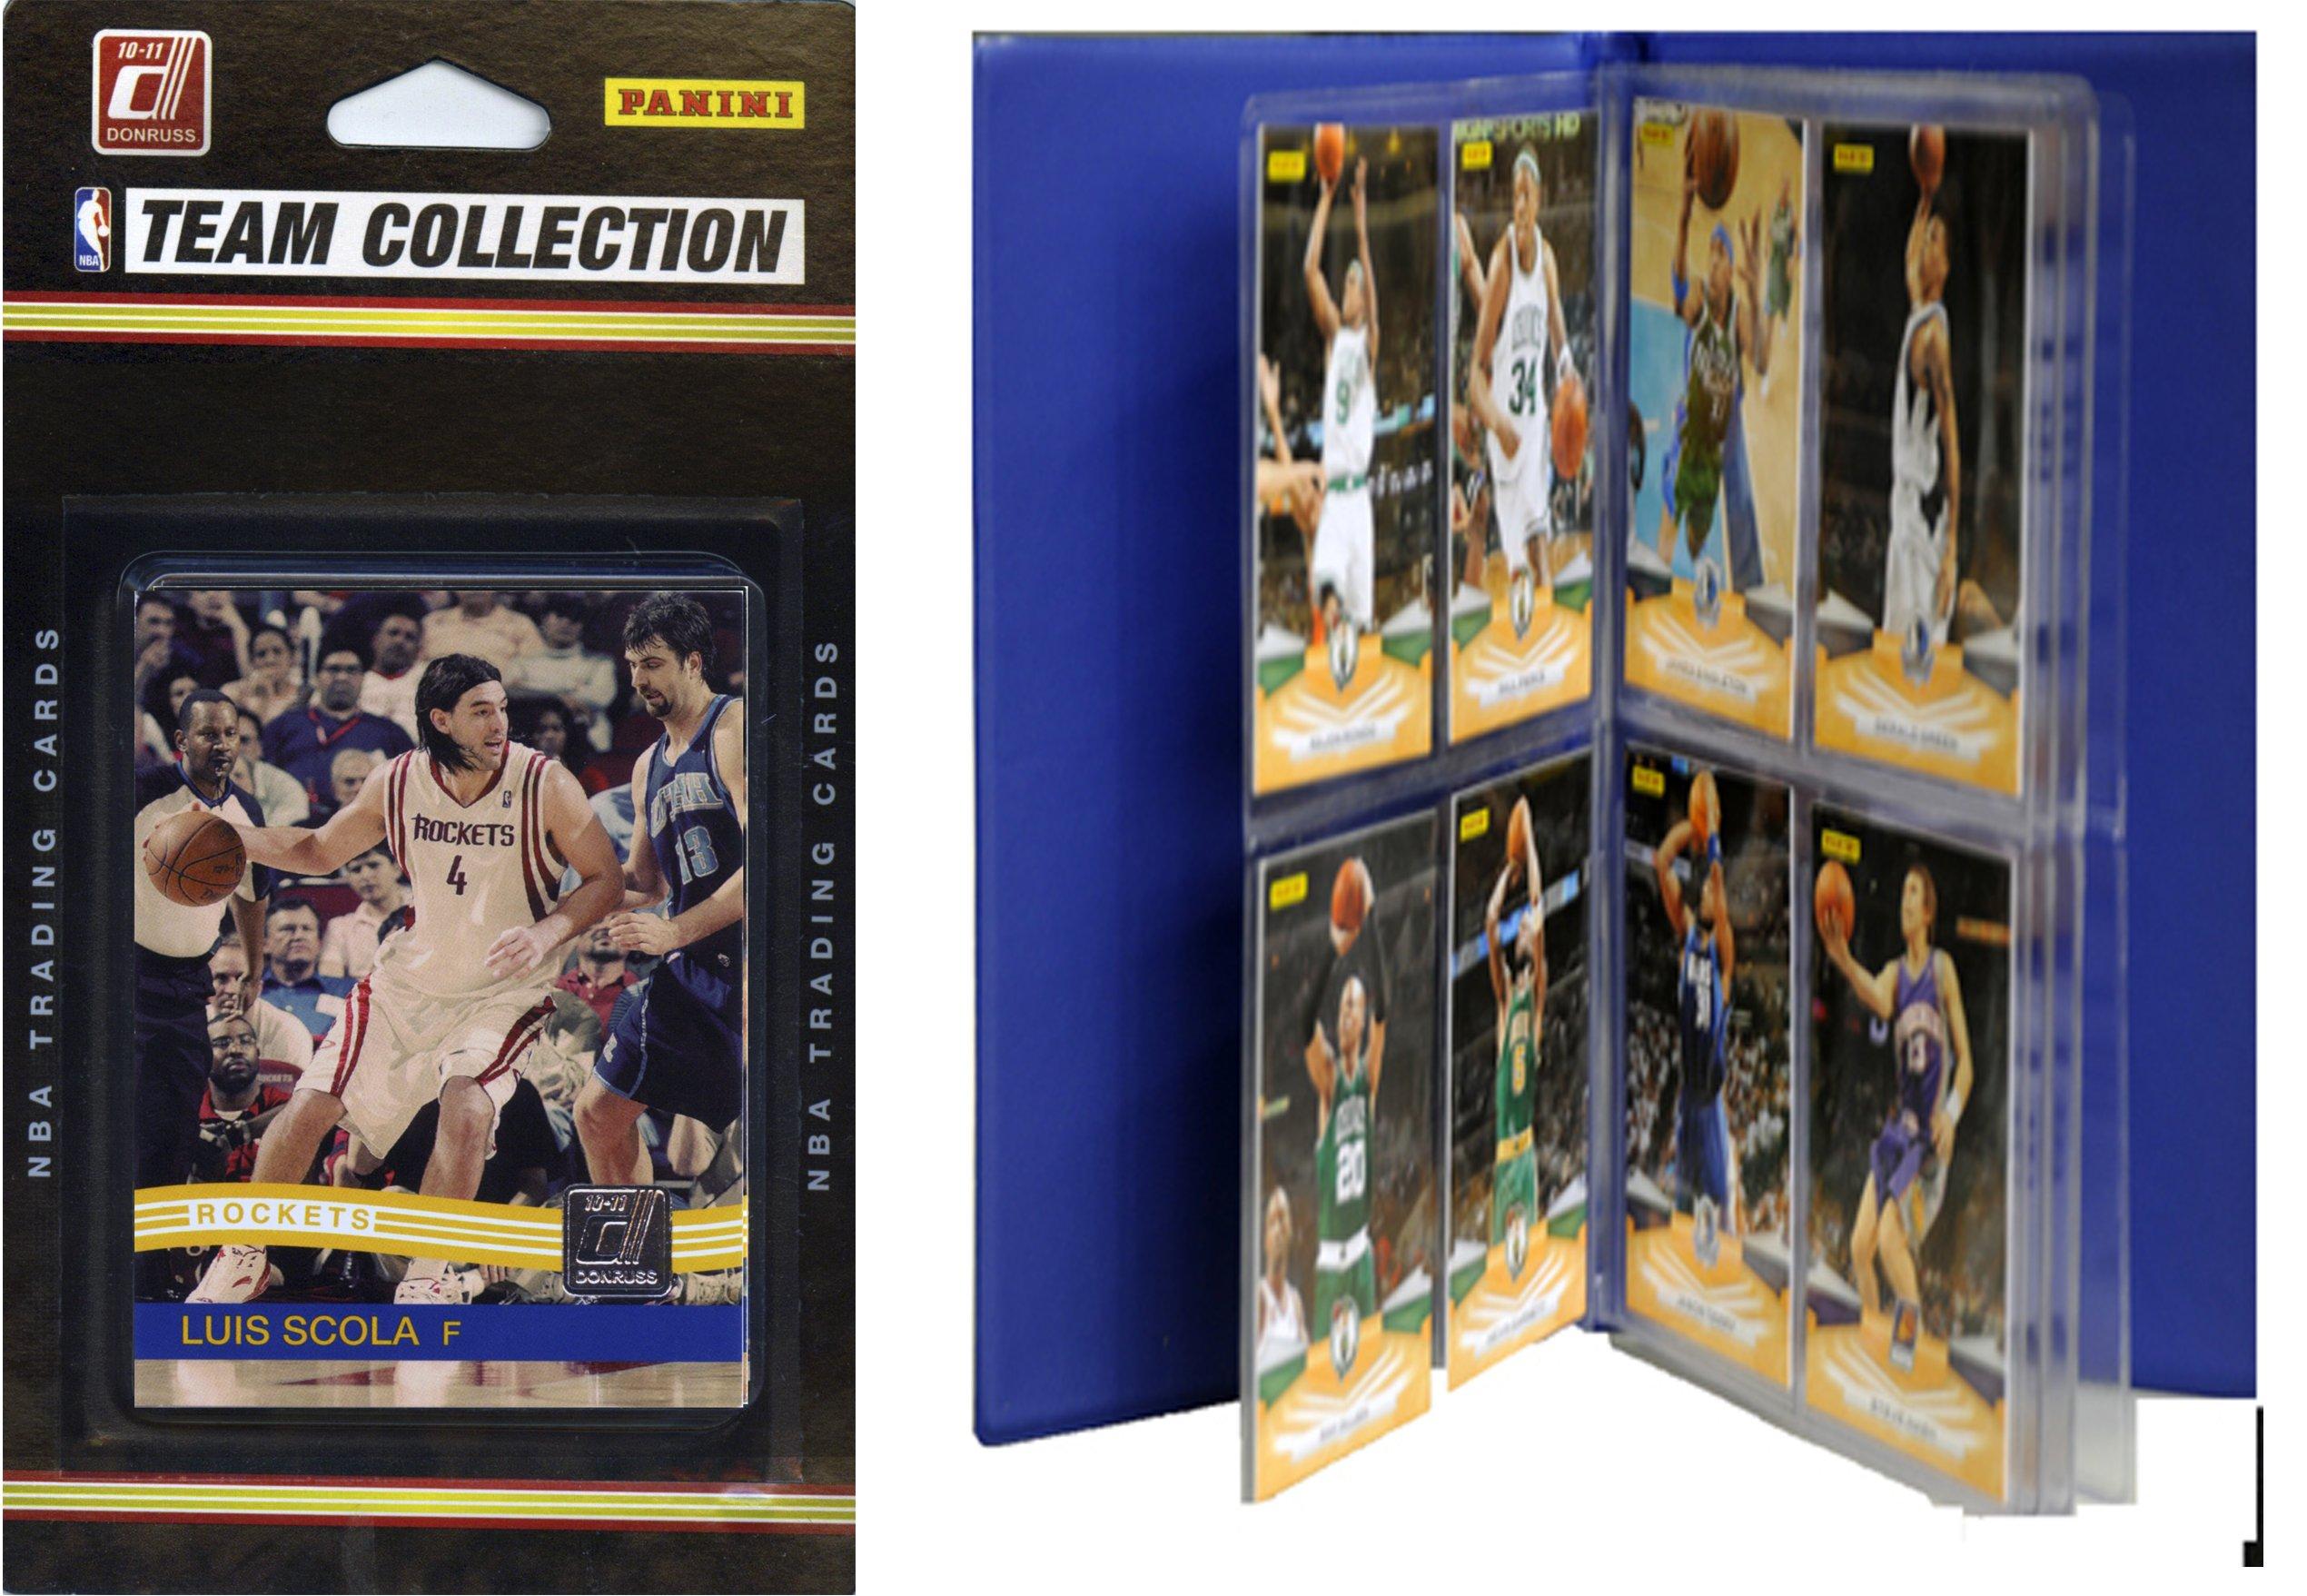 NBA Houston Rockets Licensed 2010-11 Donruss Team Set Plus Storage Album by C&I Collectables